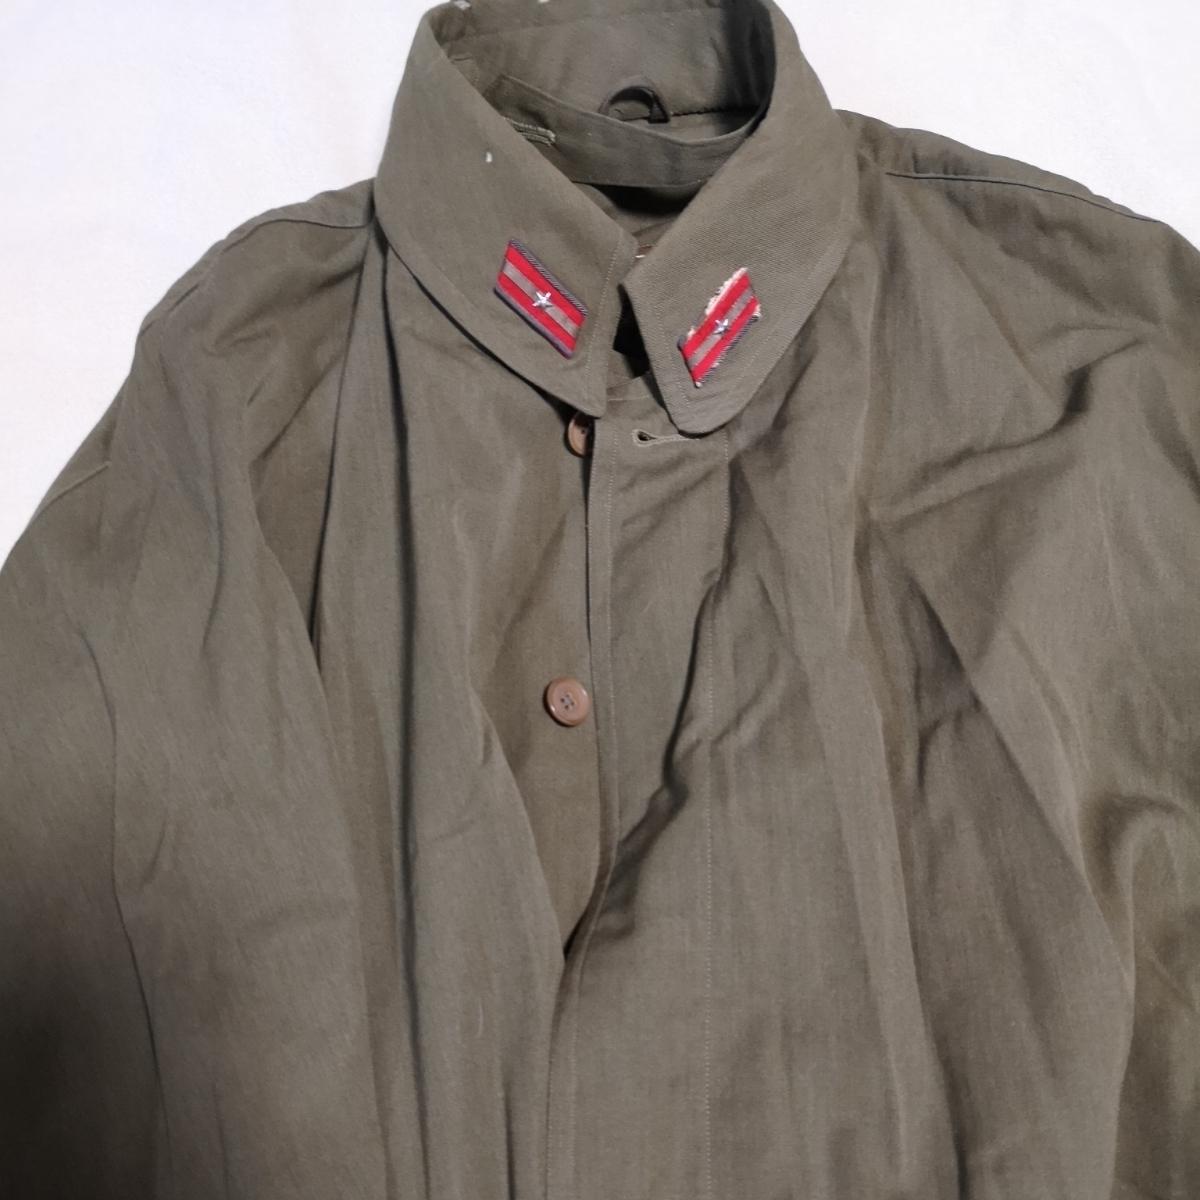 日本軍 将校マント 少尉 外套 襟章付き 戦前 洋品店仕立 軍服_画像2